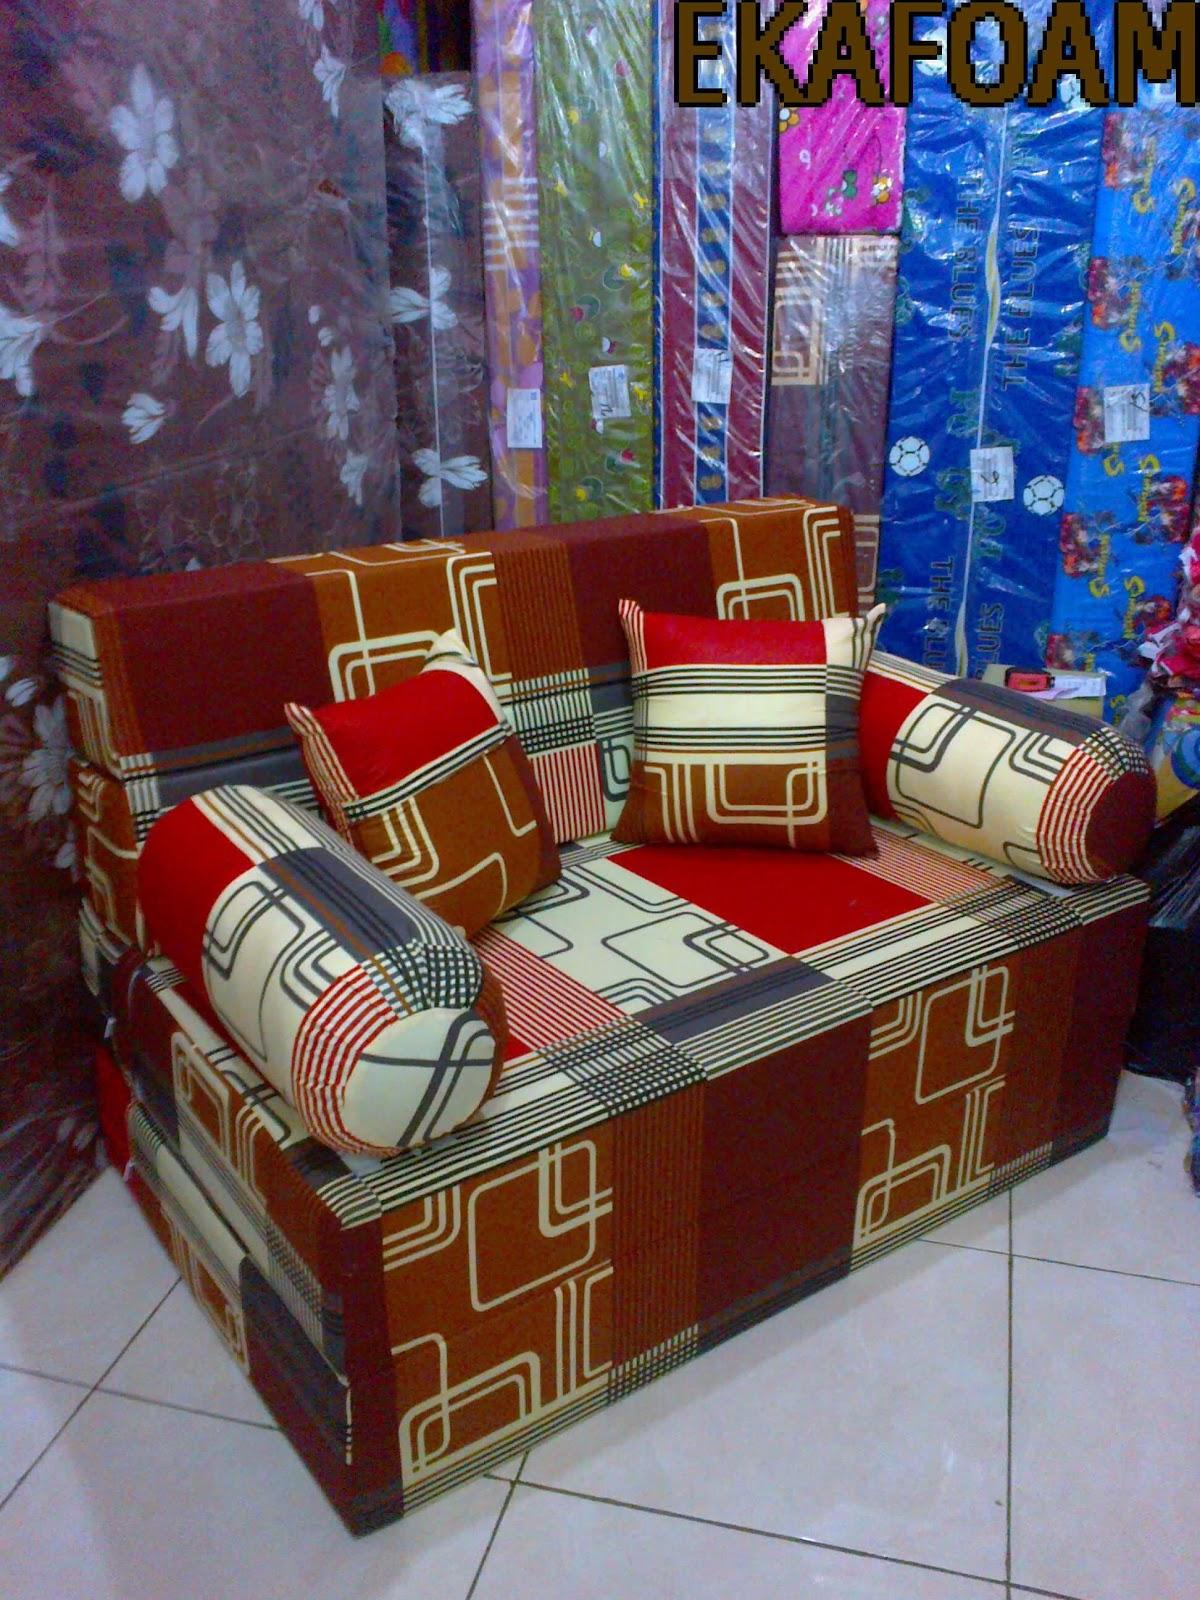 harga sofa bed inoac cikarang silver leather tufted daftar kasur busa terbaru 2016 ekafoam